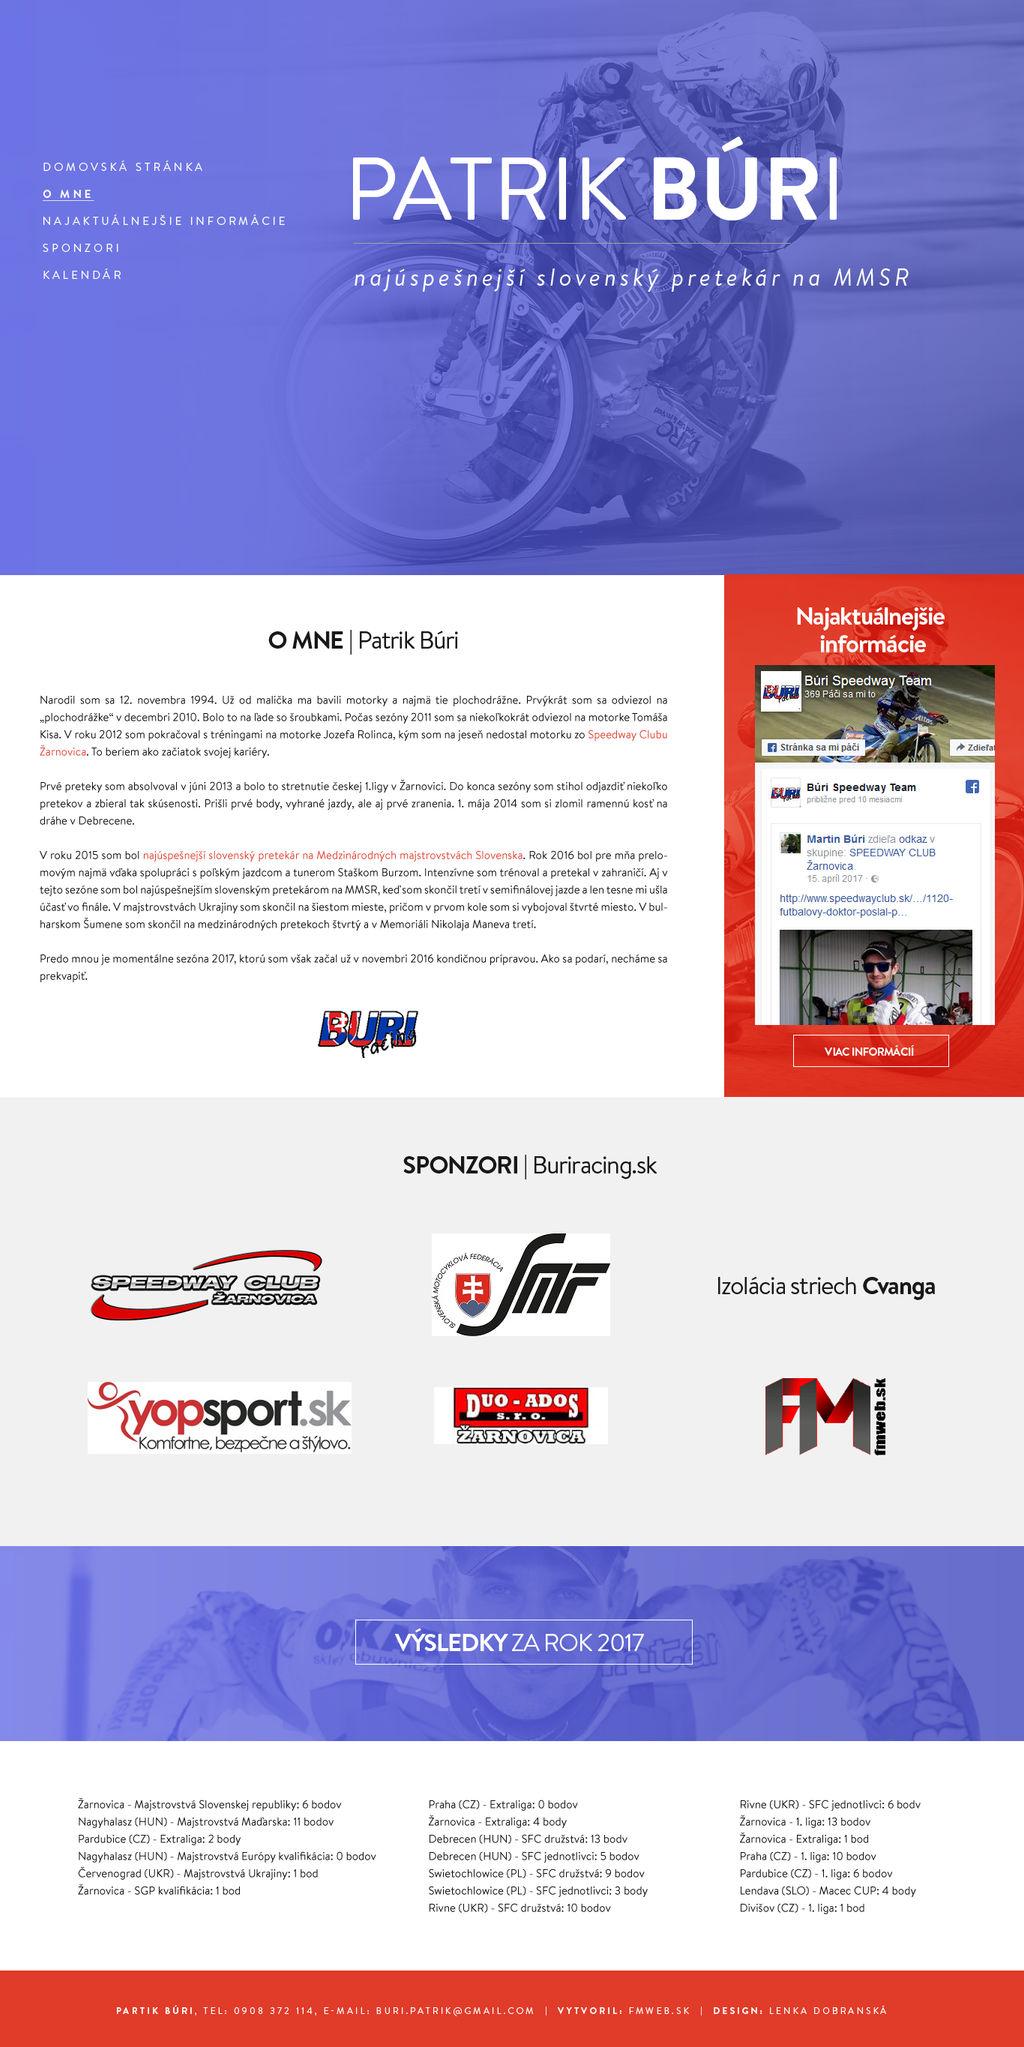 Official Website - Patrik Buri | buriracing.sk by lenkamason